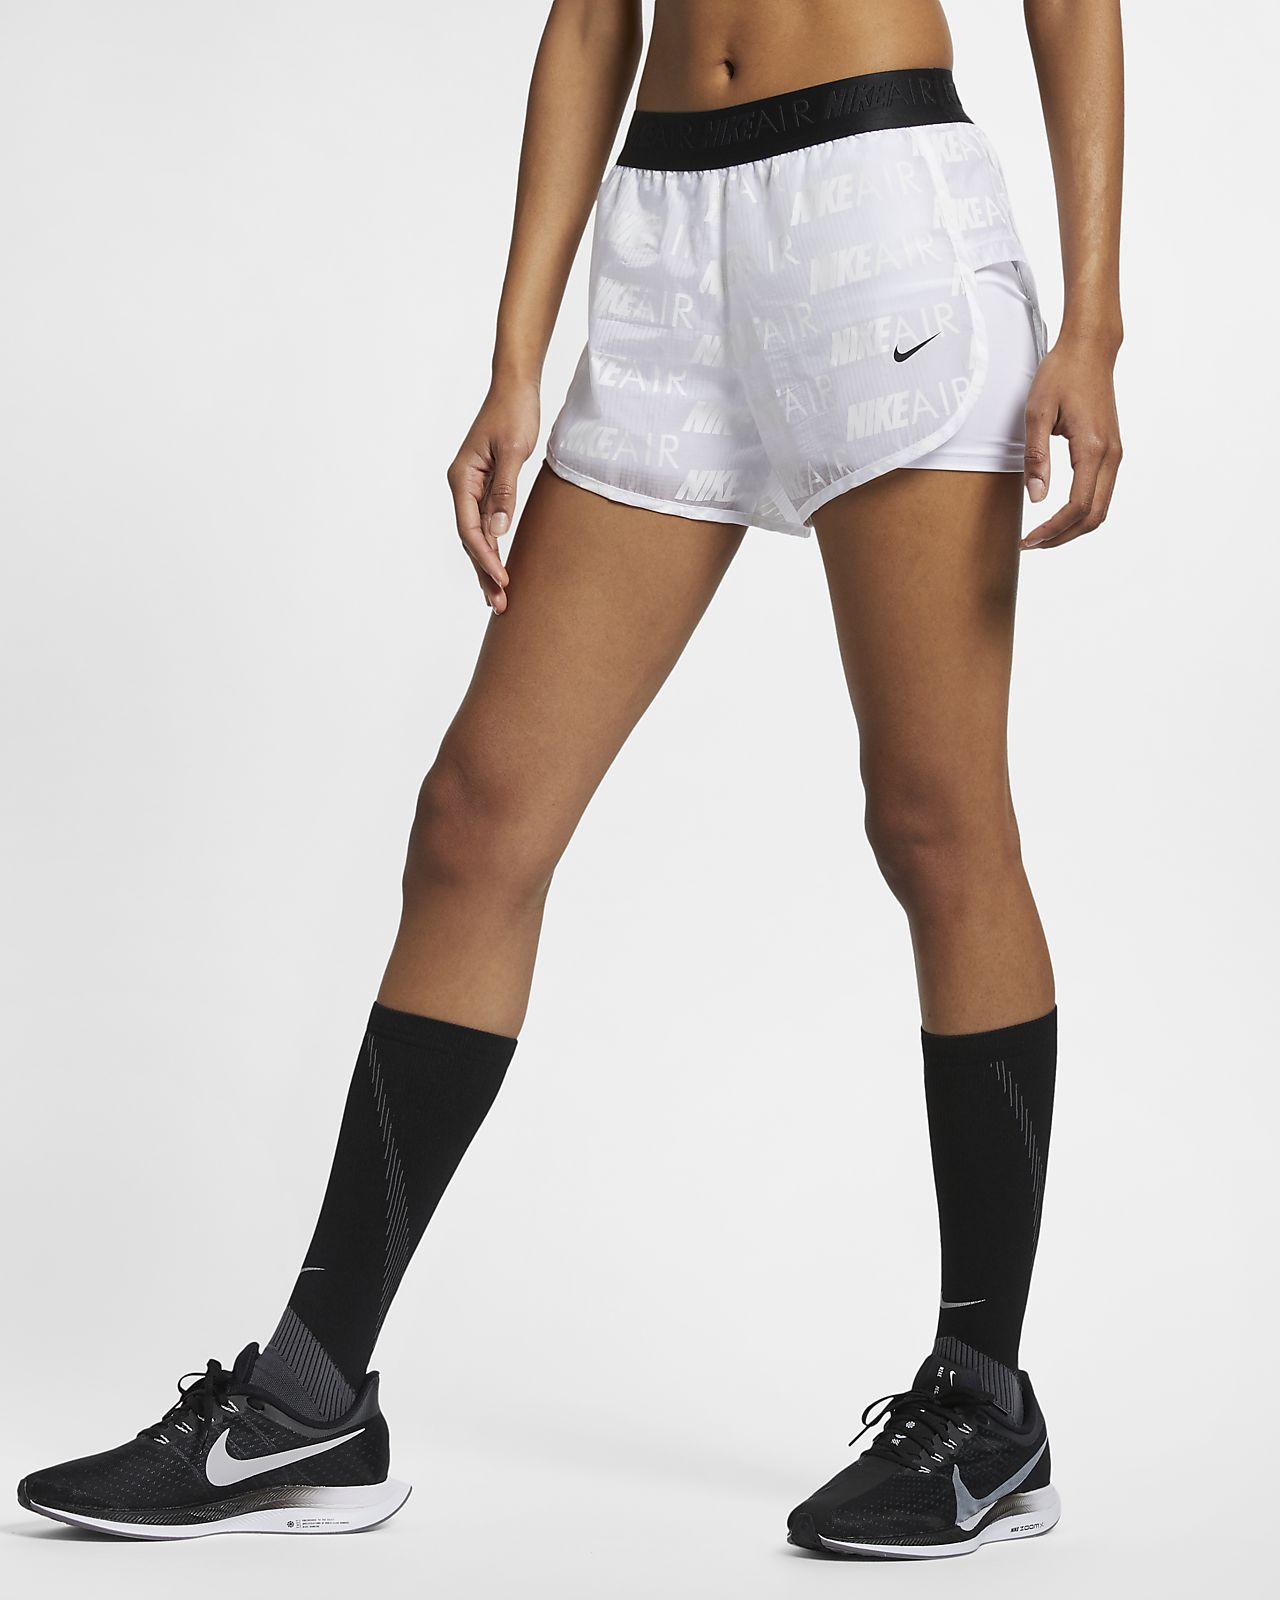 Nike Air Women's Running Shorts